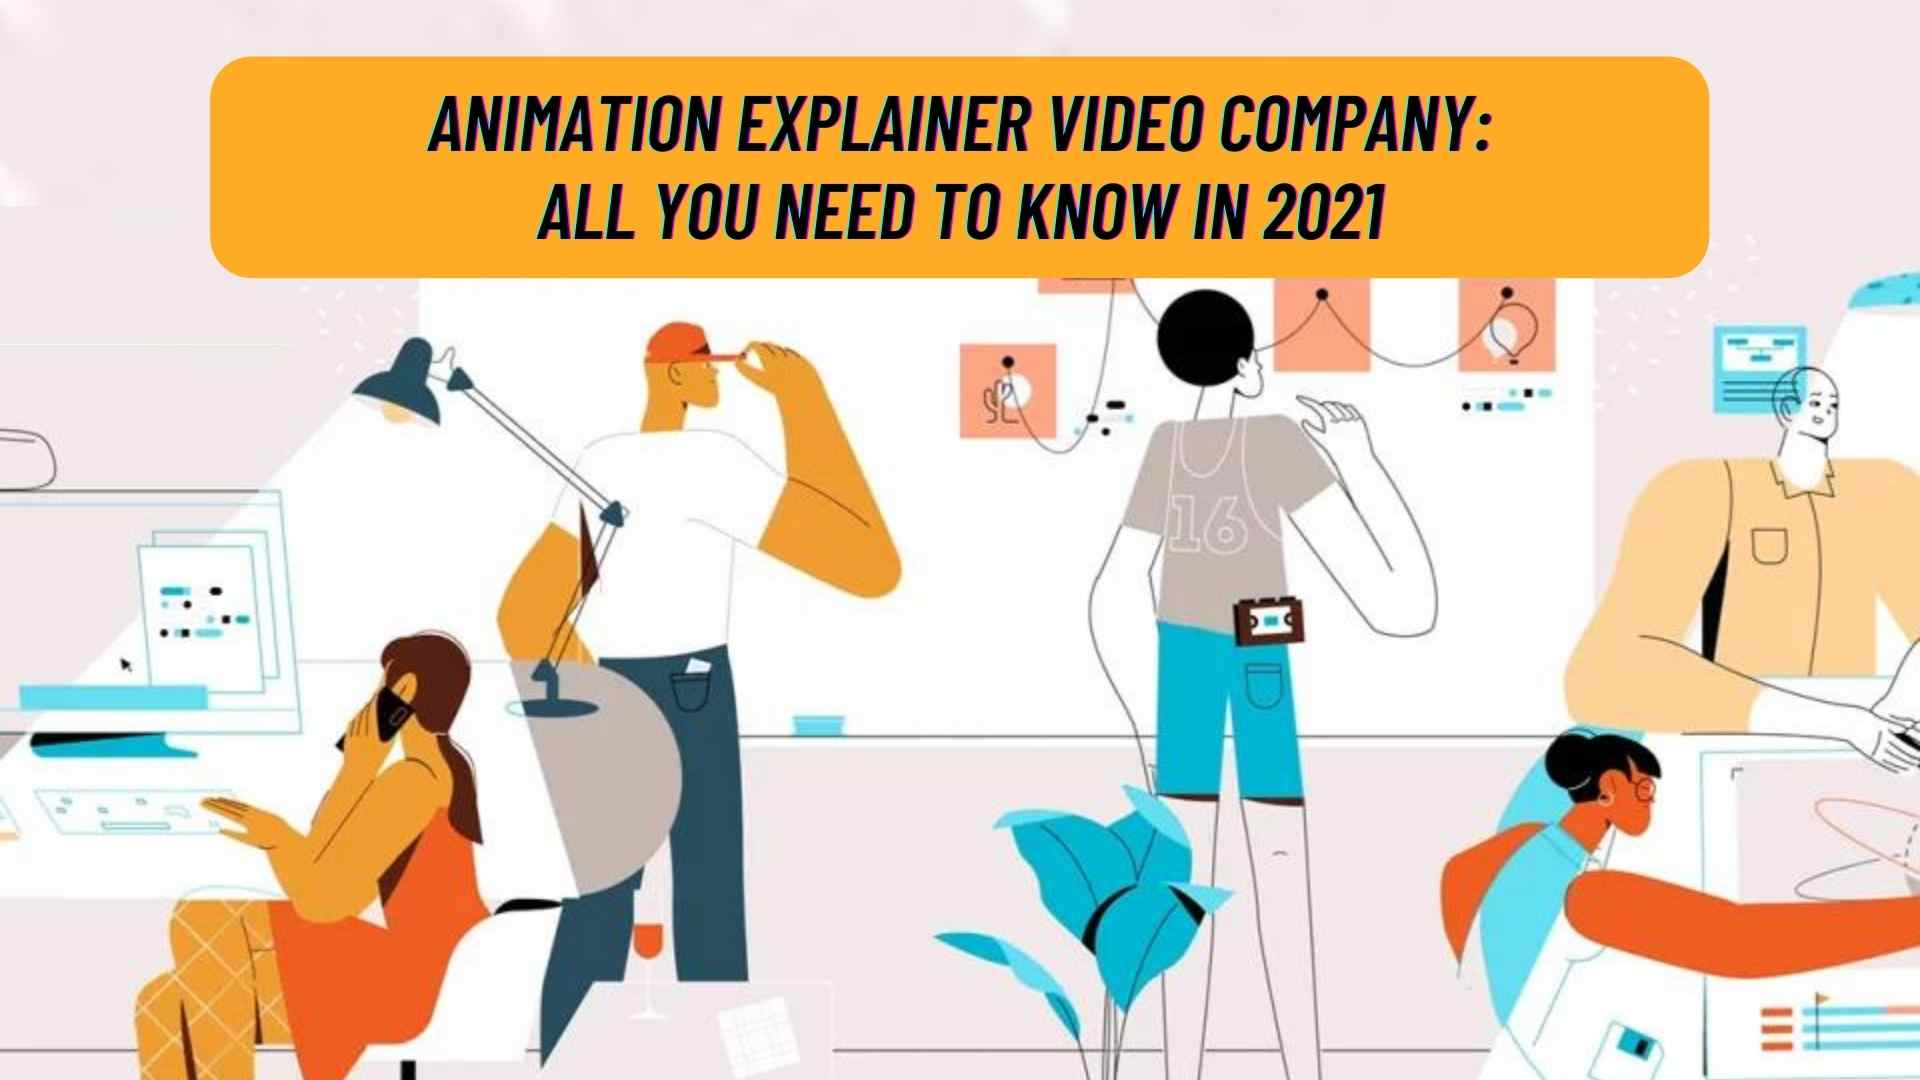 Professional Animation explainer video company